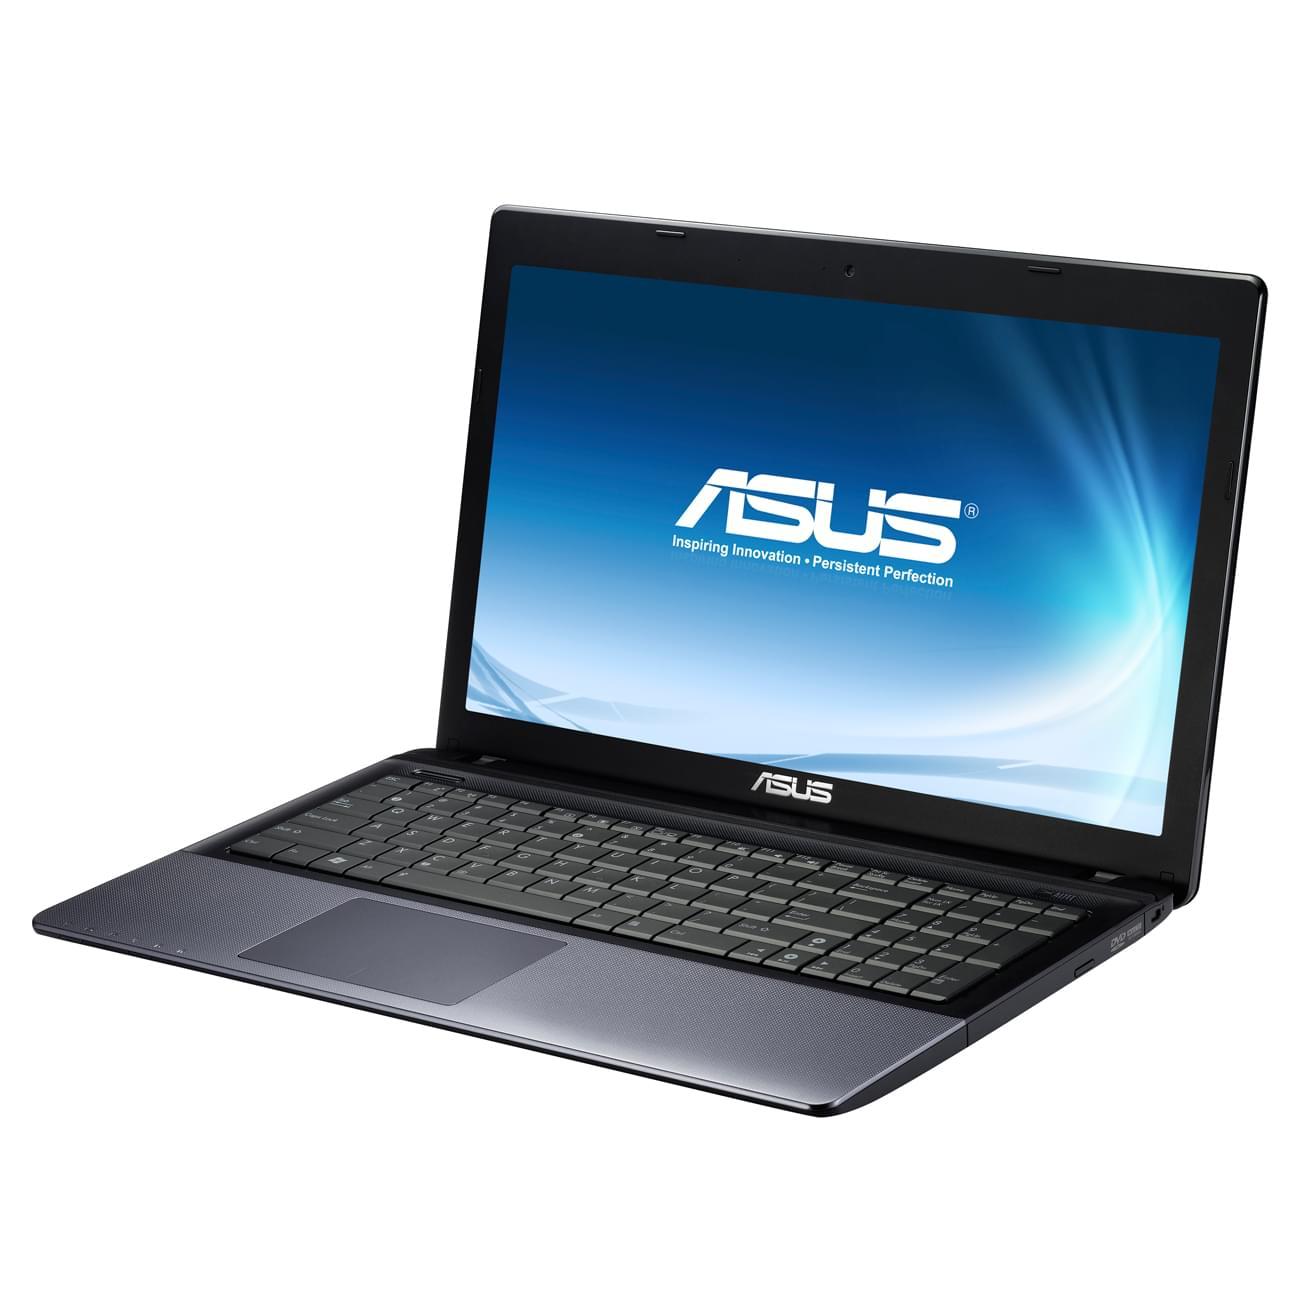 Asus X55VD-SX168H (X55VD-SX168H obso) - Achat / Vente PC Portable sur Cybertek.fr - 0